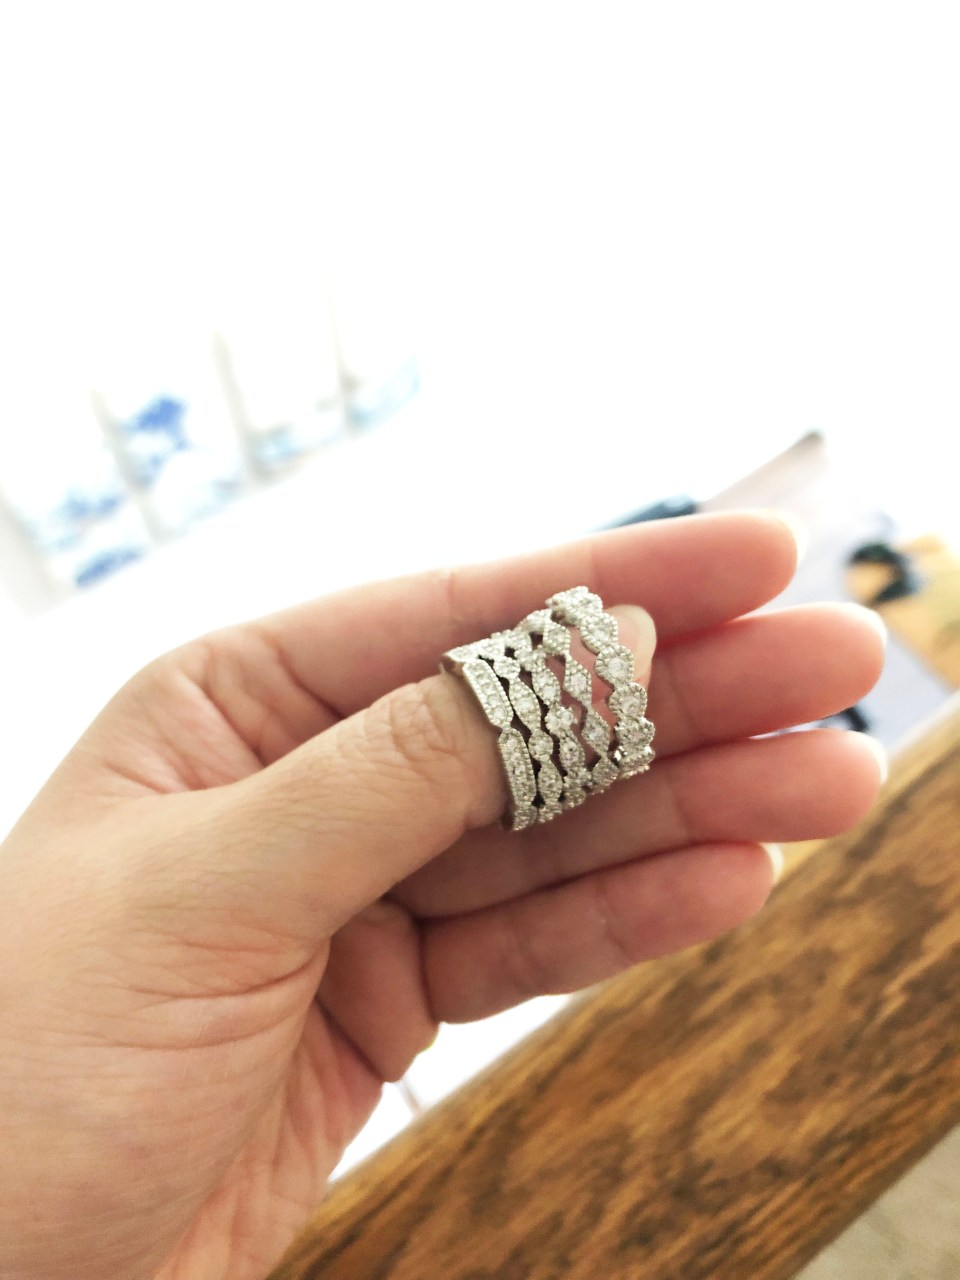 PalmBeach Jewelry - Eternity Ring Stack 9